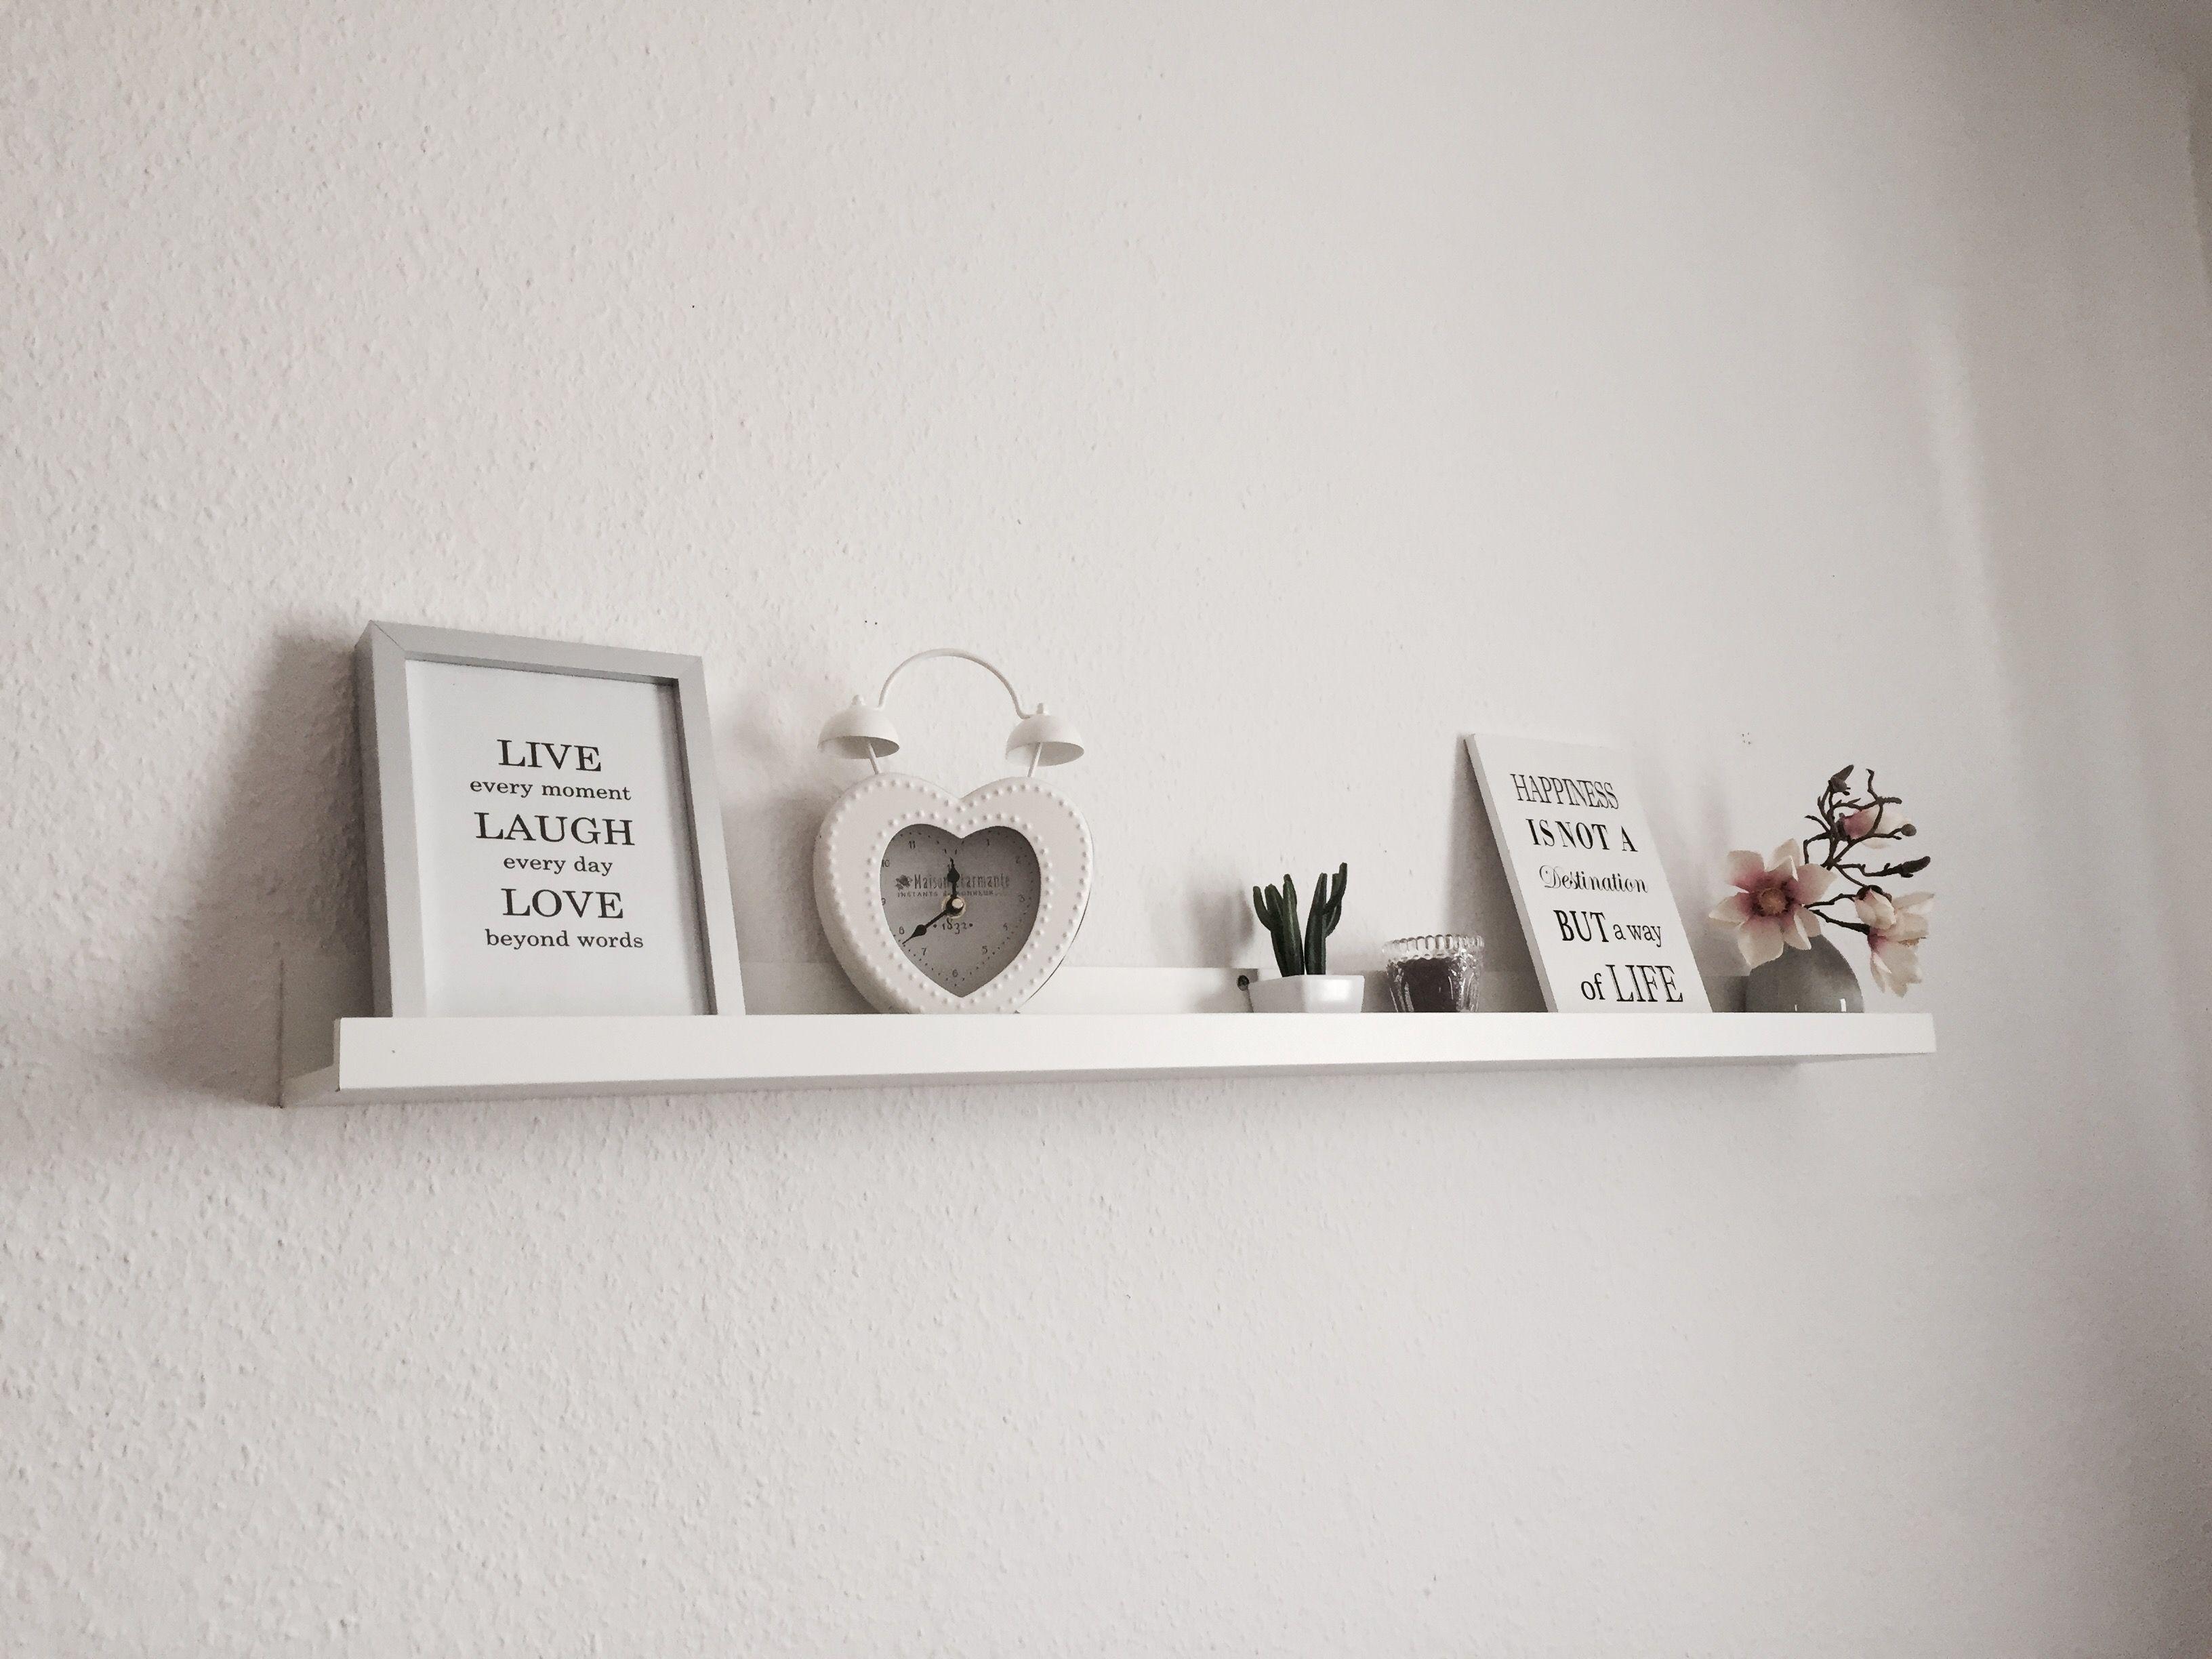 ikea bilderleiste-magnolienzweig   ideias de quarto   pinterest